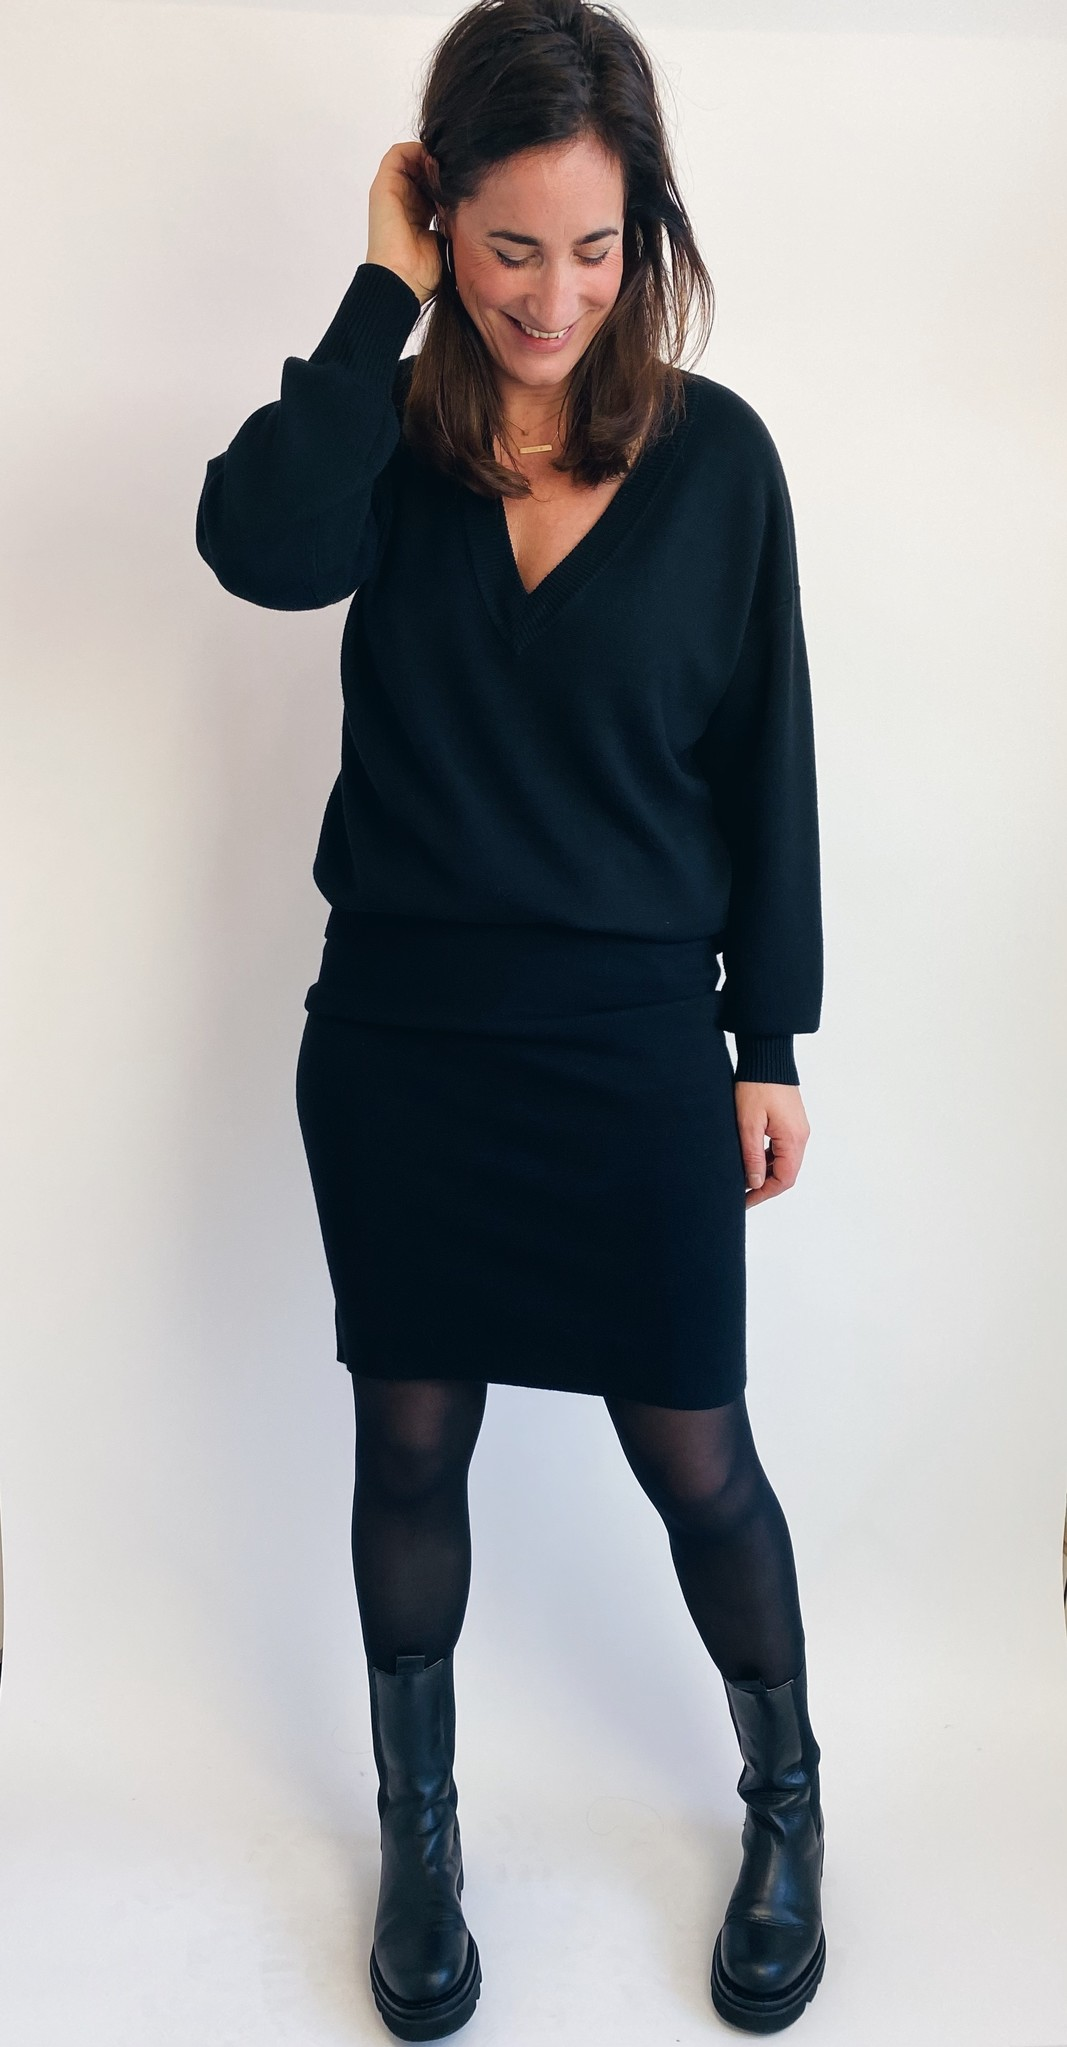 Rok KAkitlyn knit skirt black deep-4